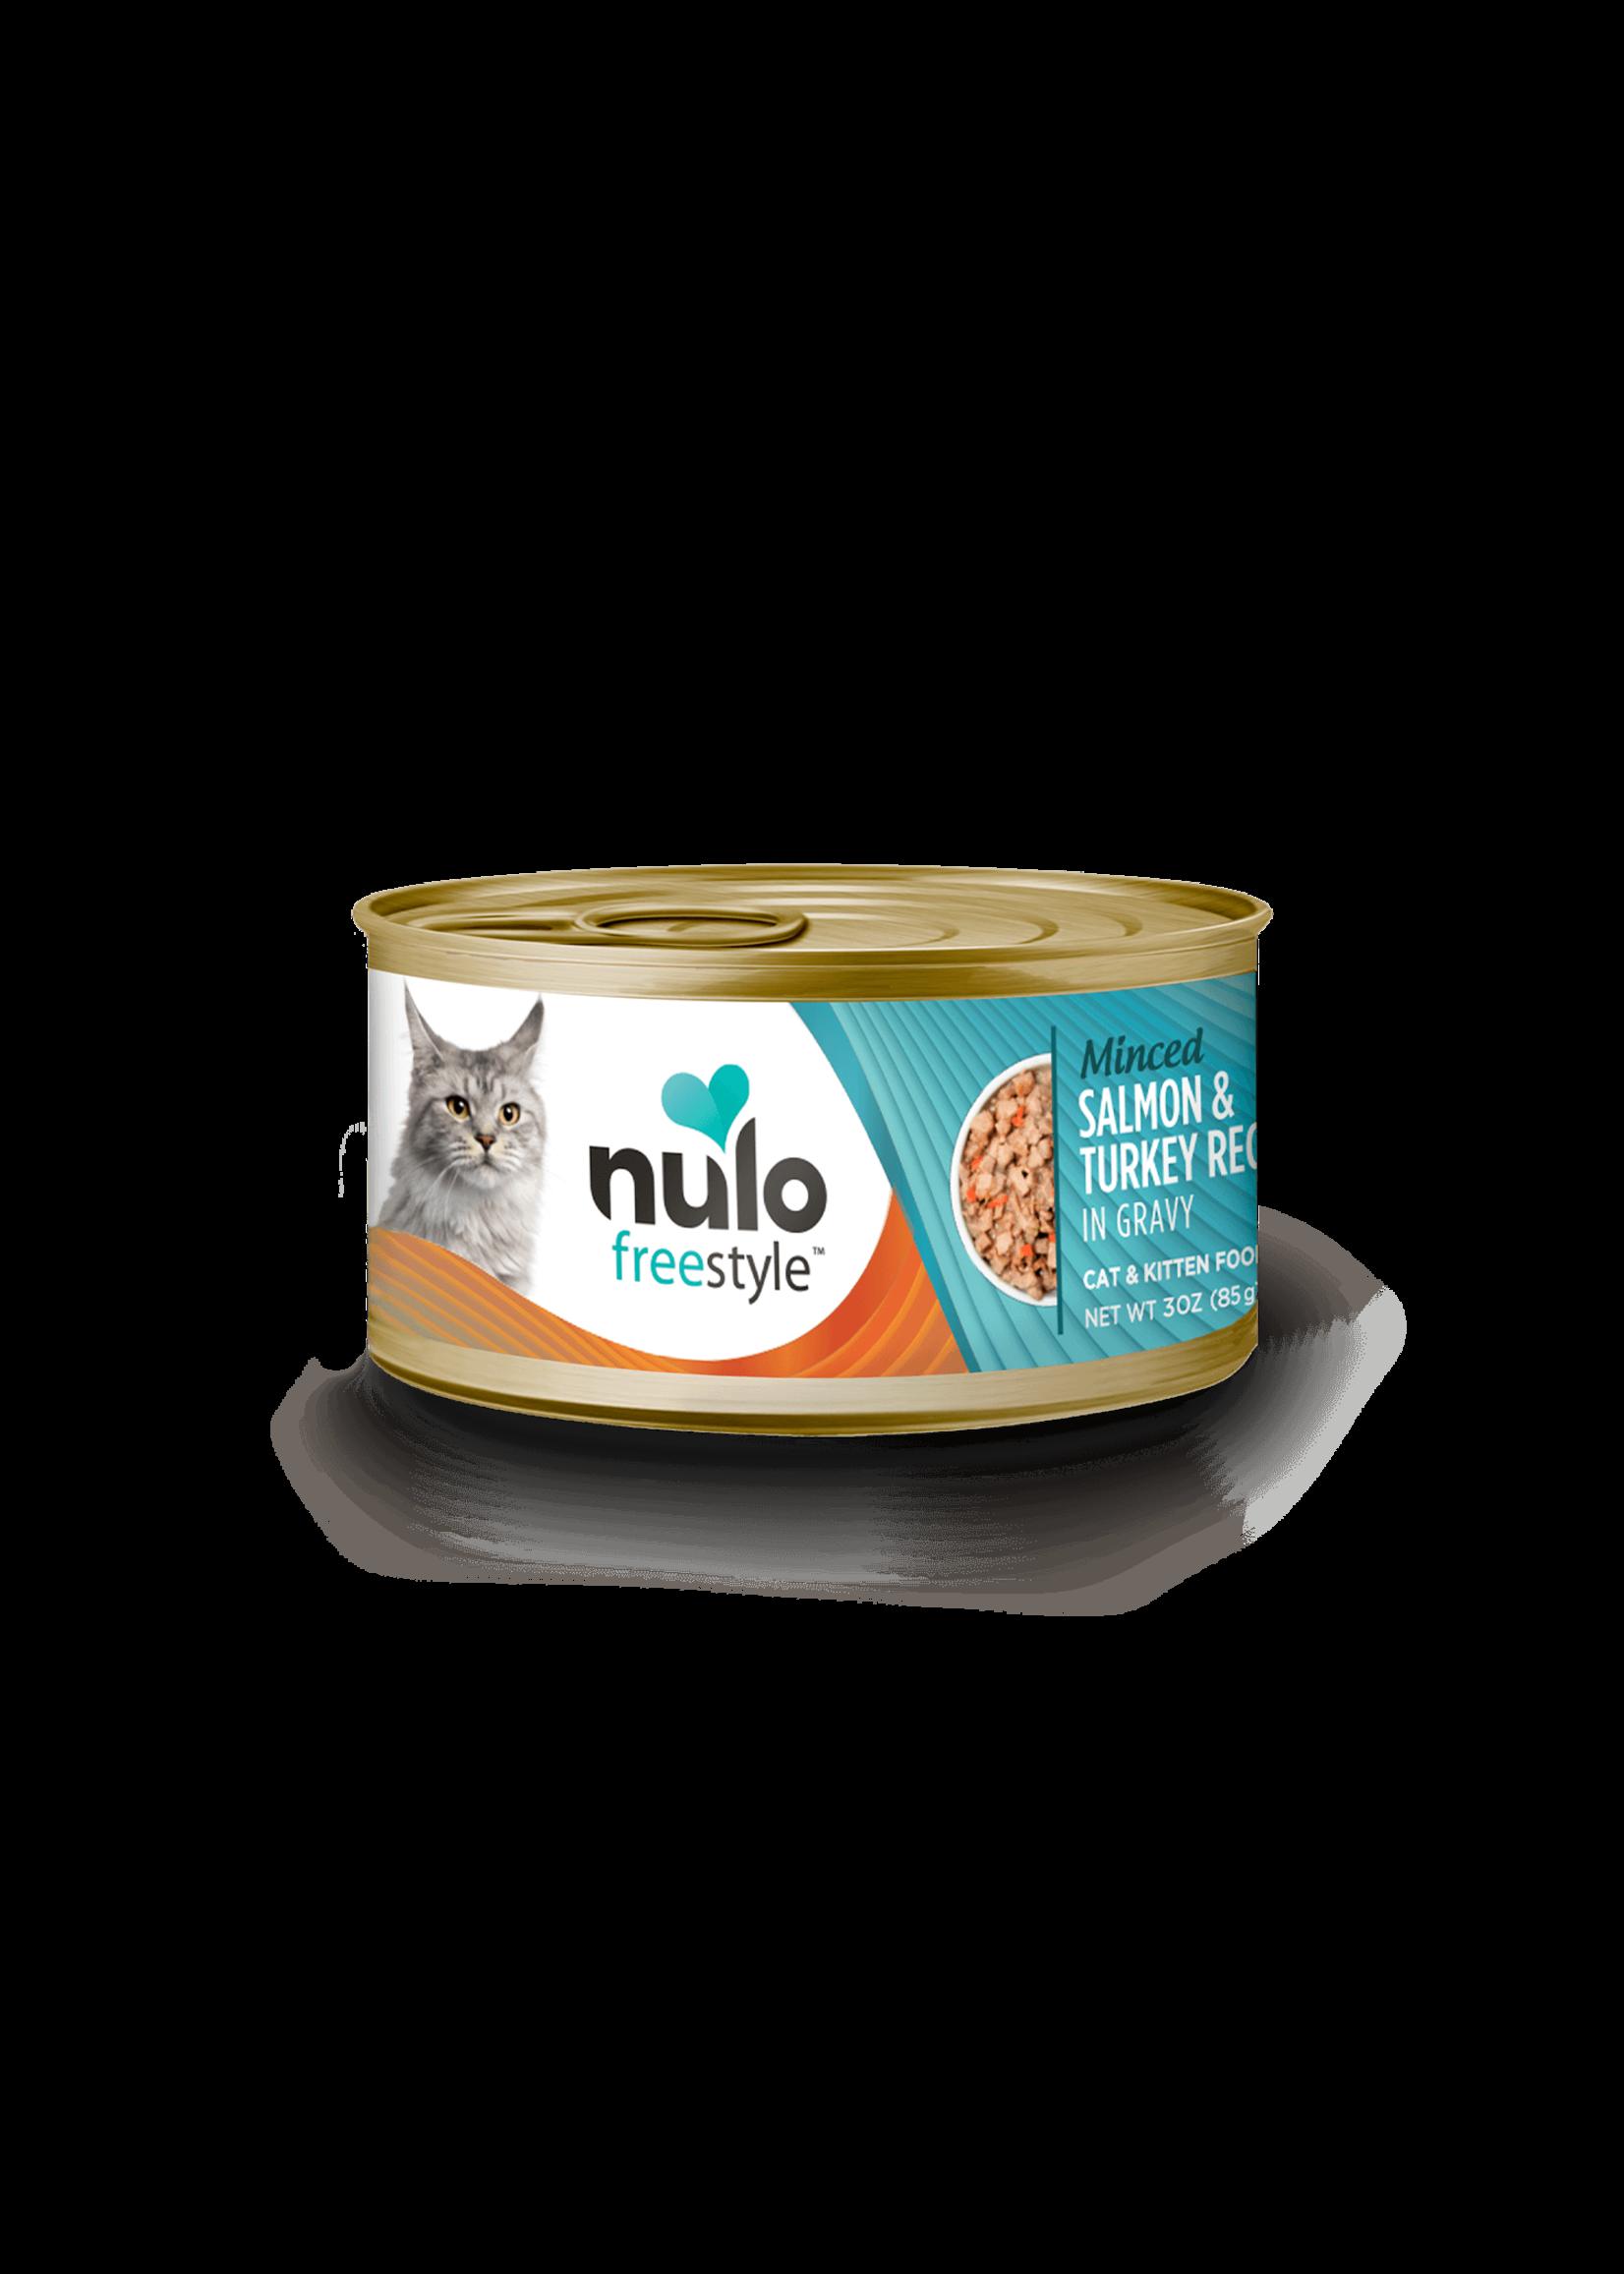 Nulo Nulo FreeStyle Grain Free Cat Food Minced Salmon & Turkey in Gravy, 3oz Can